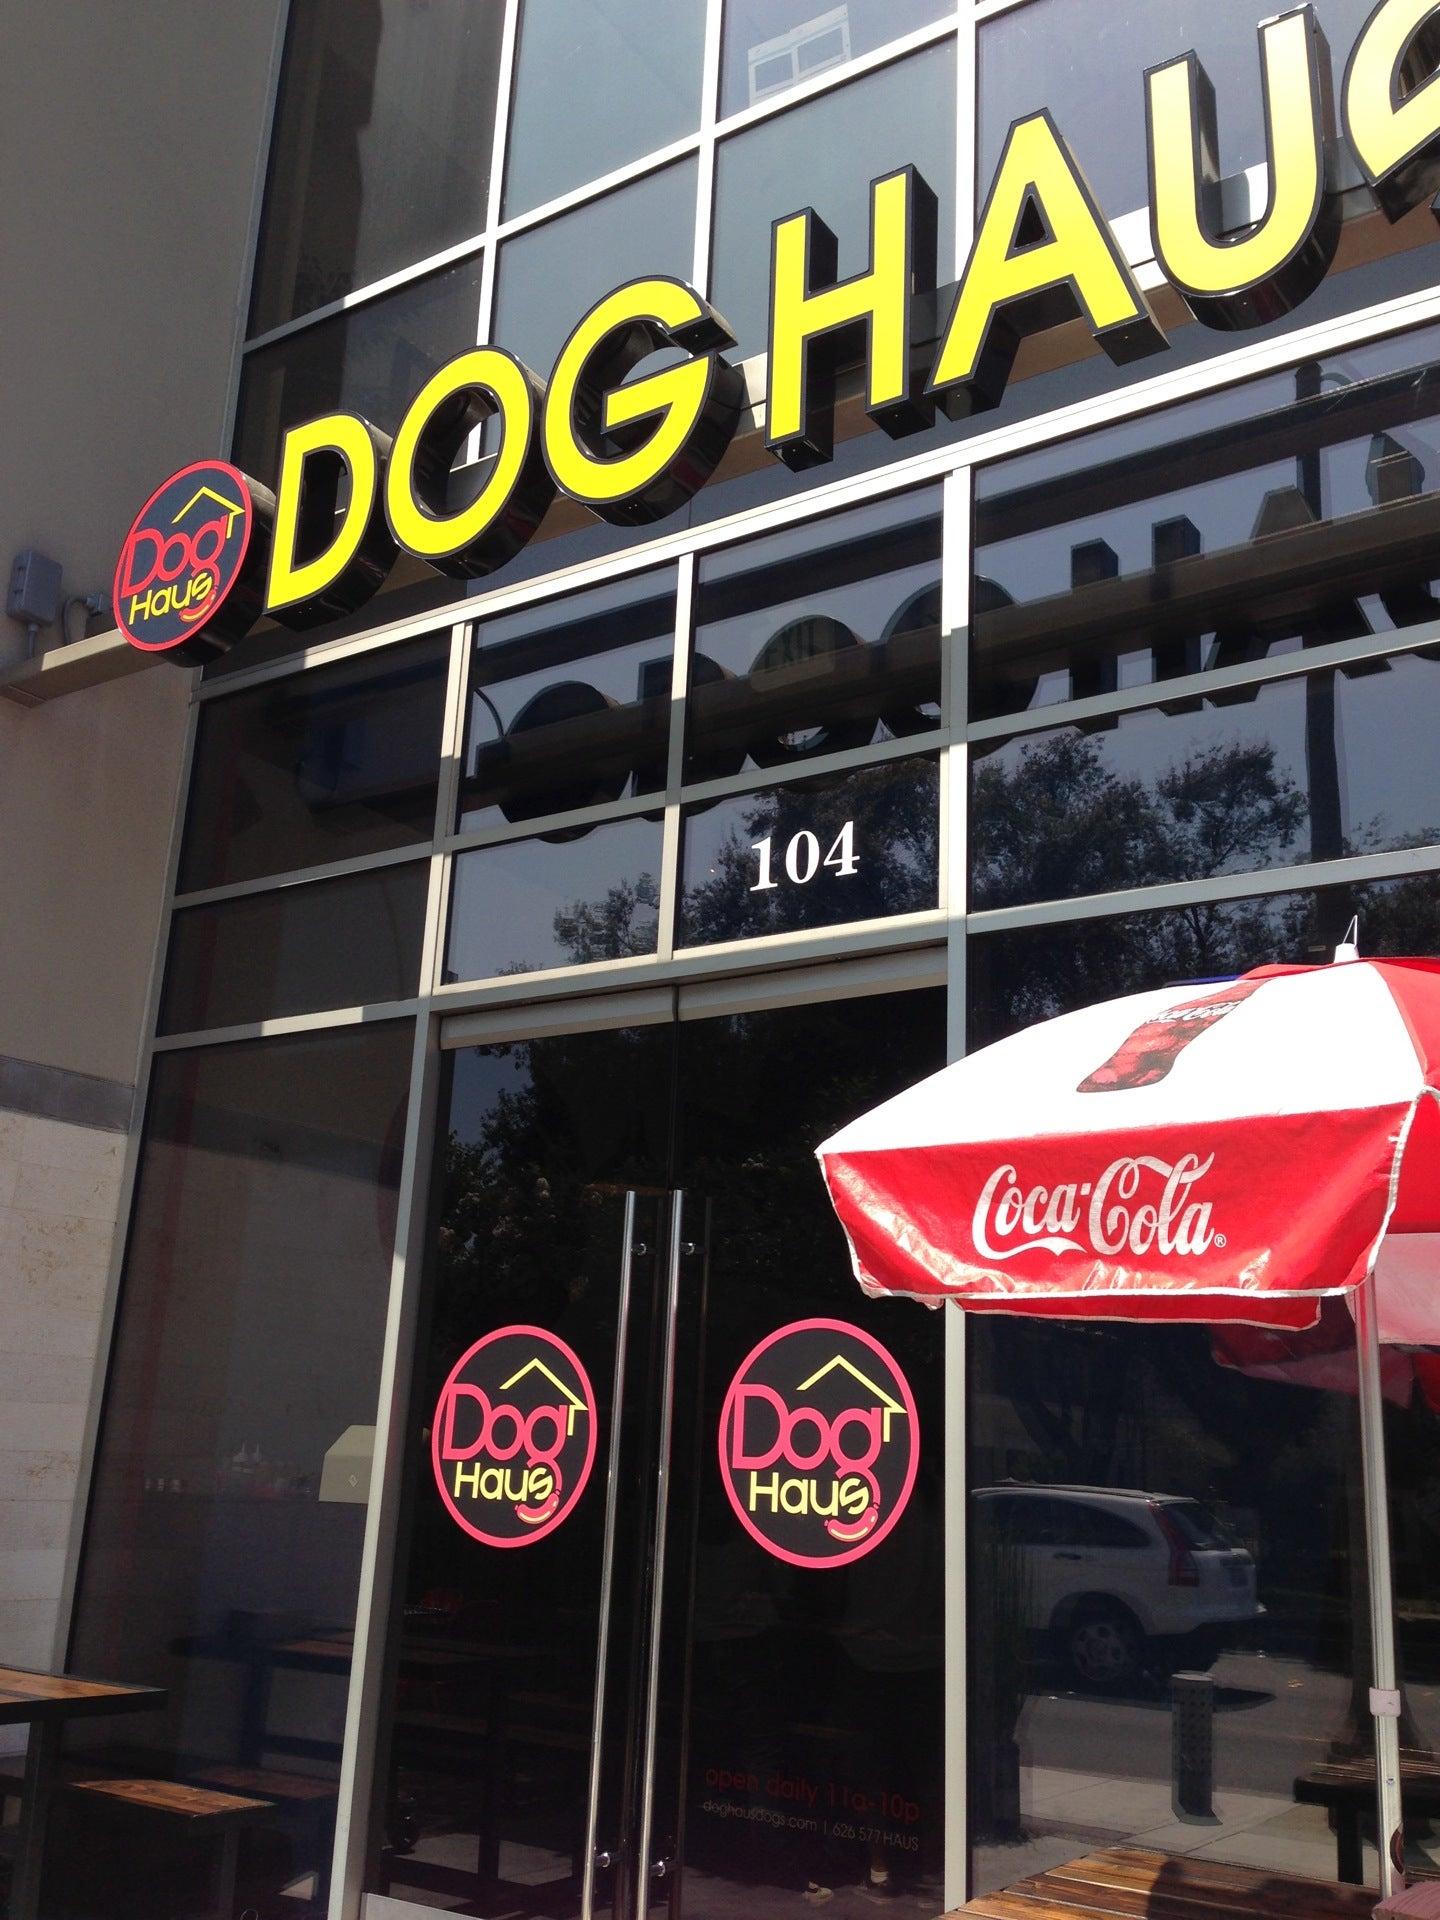 Hot Dog Haua Hours